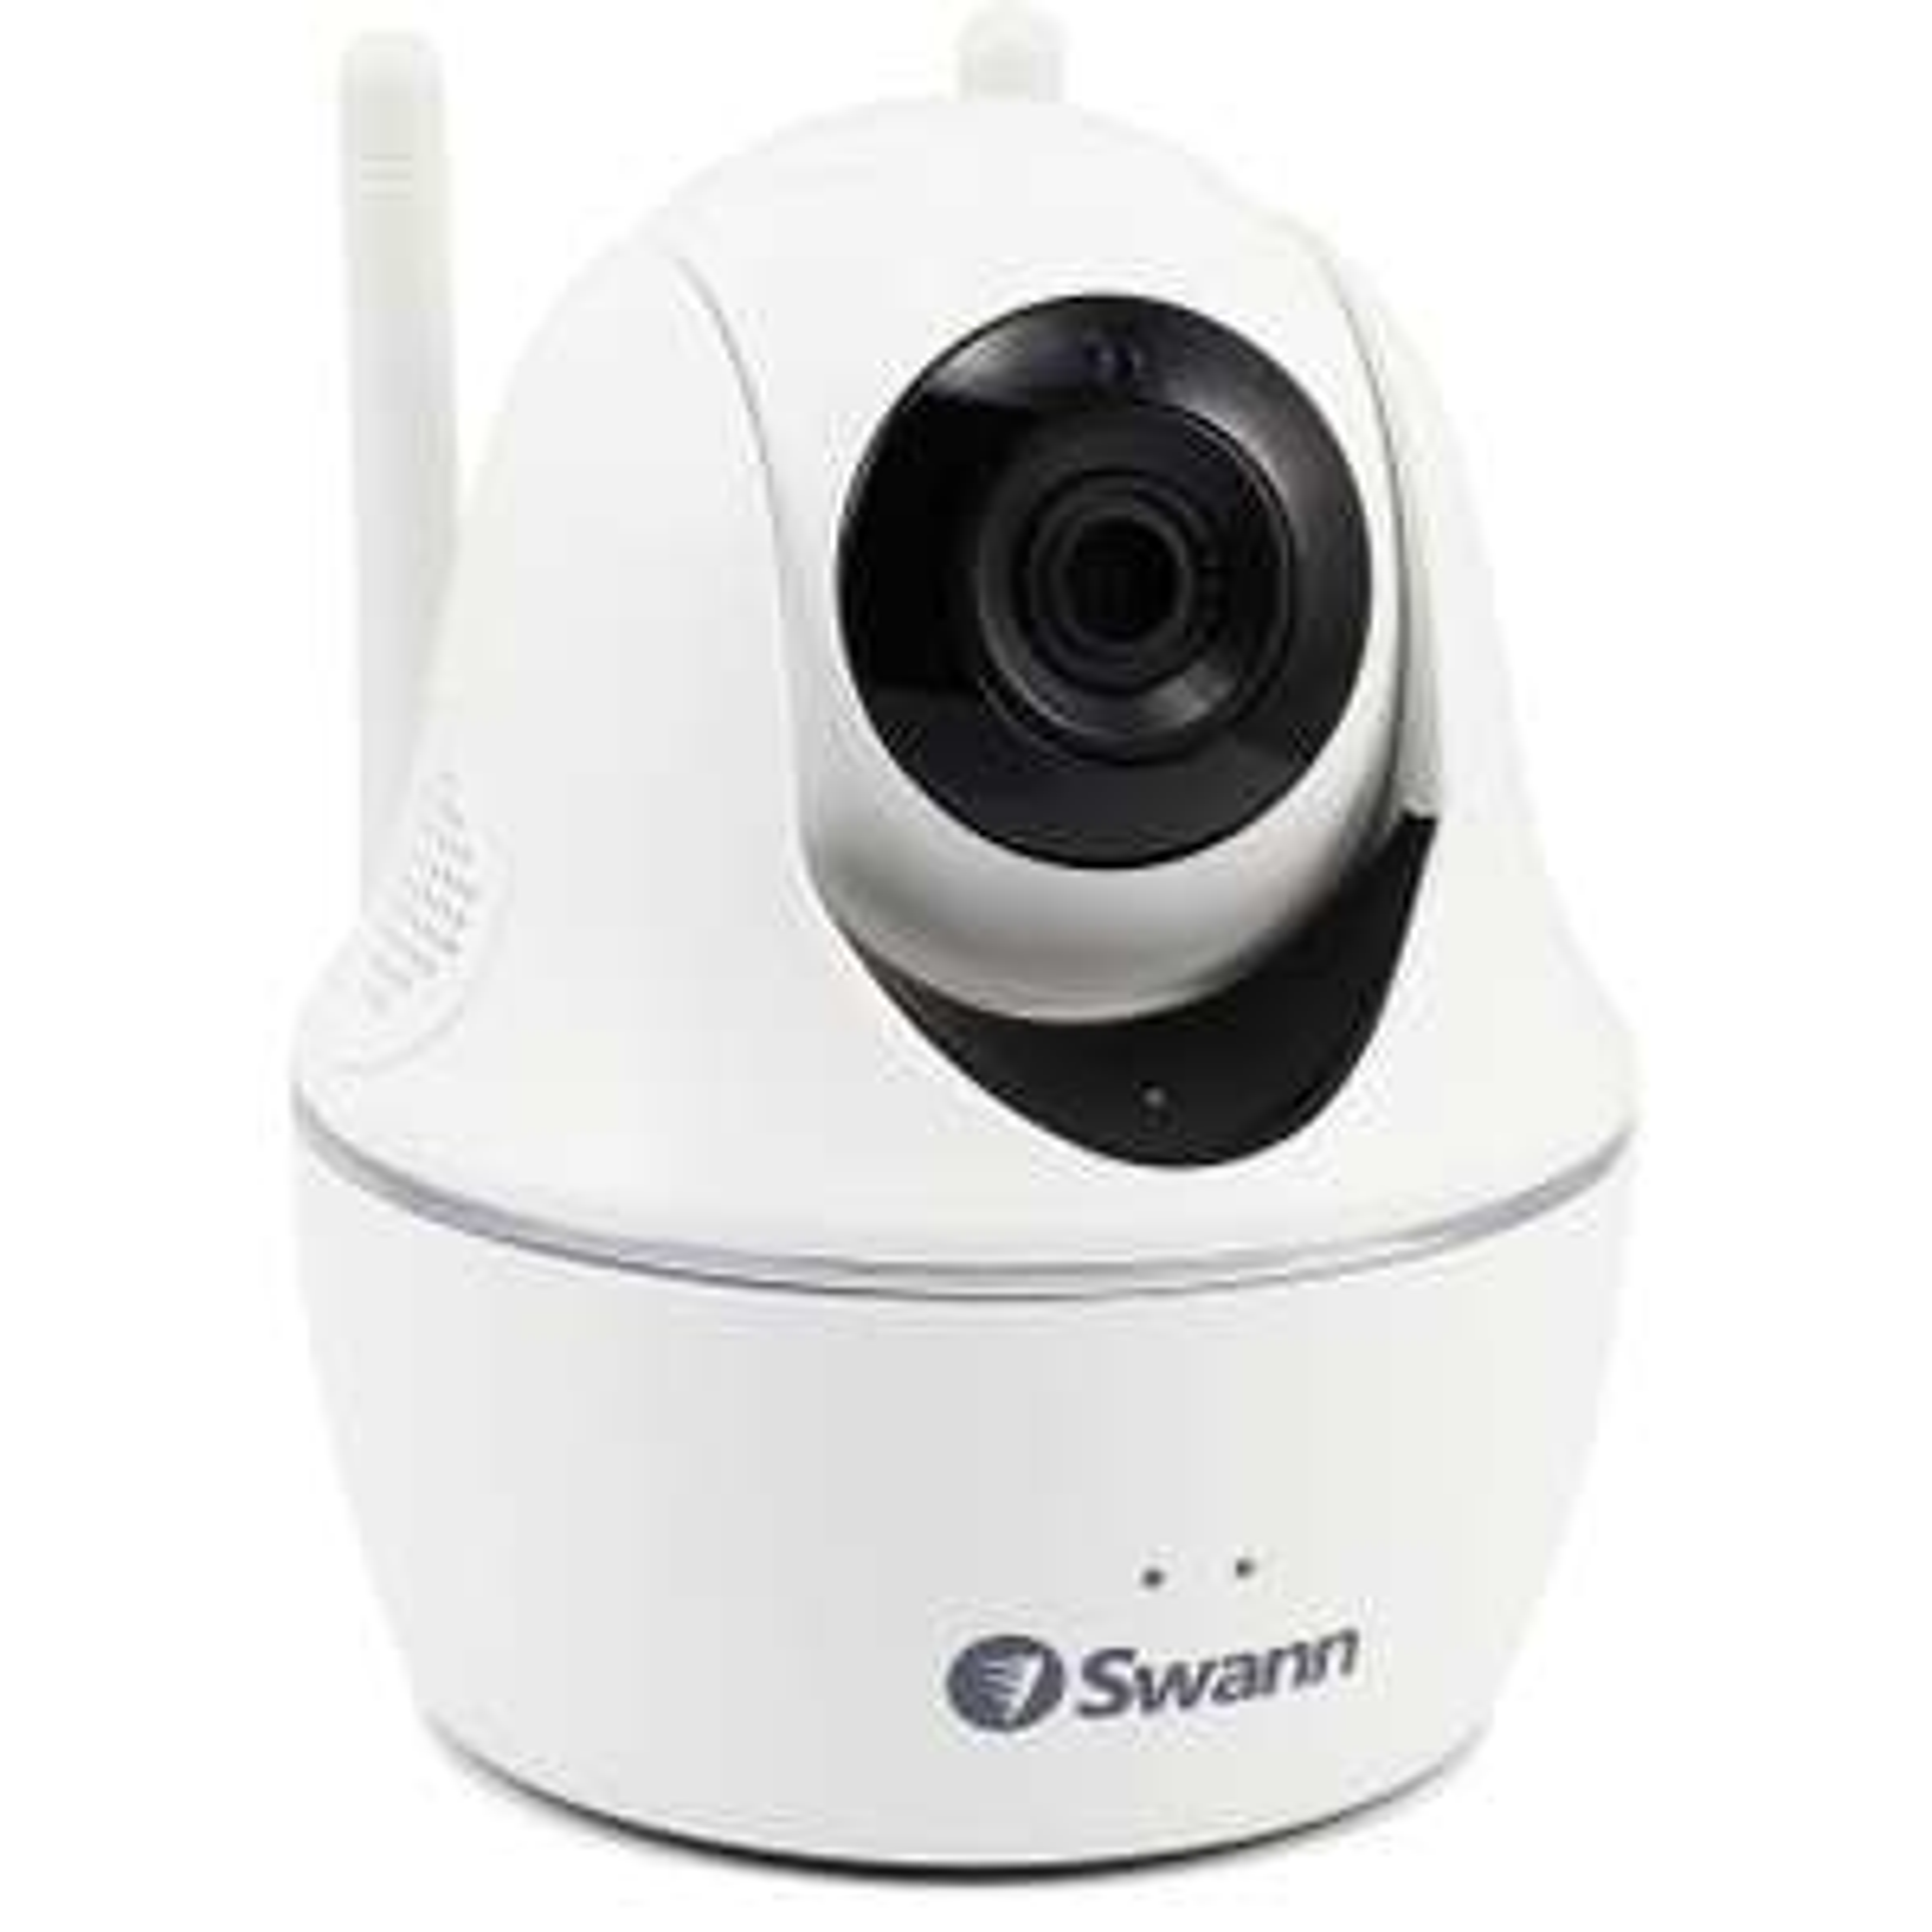 Swann pan tilt wireless camera network camera £49.99 @ Amazon